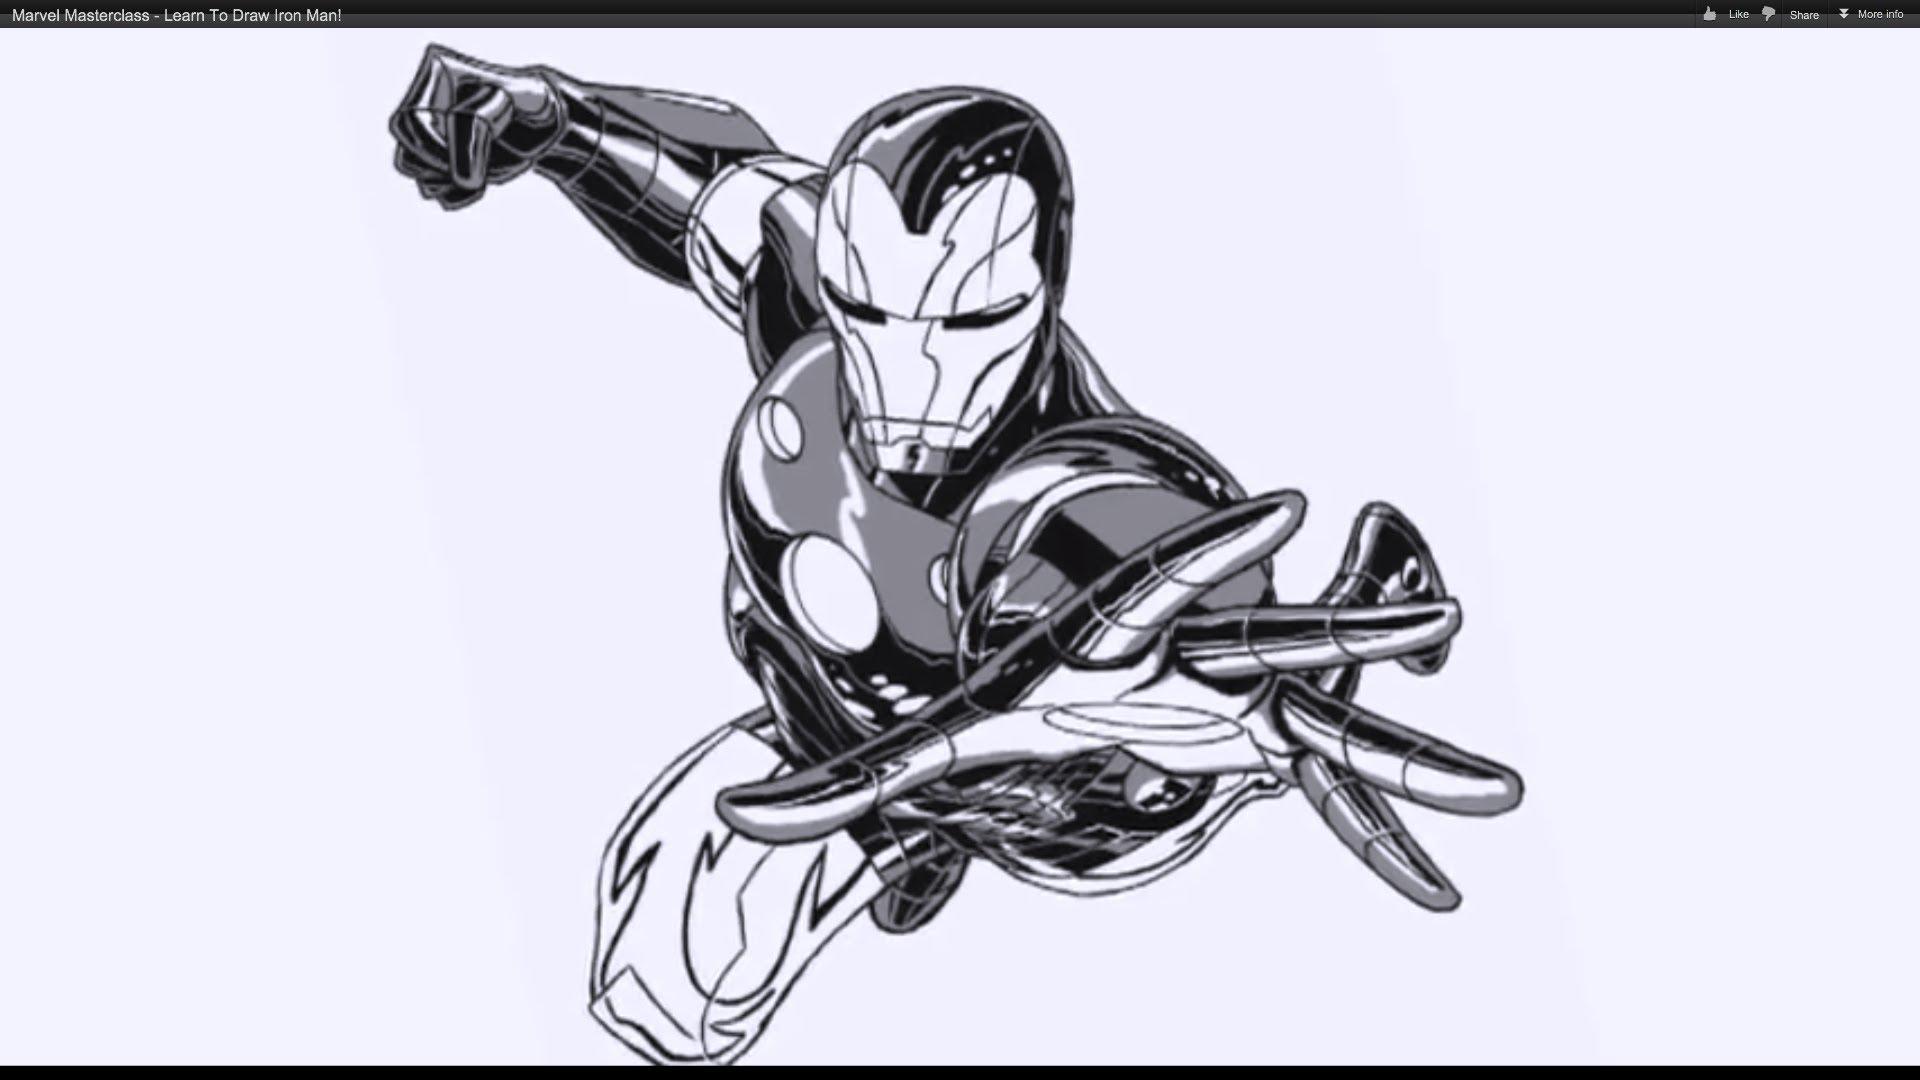 1920x1080 Marvel Masterclass